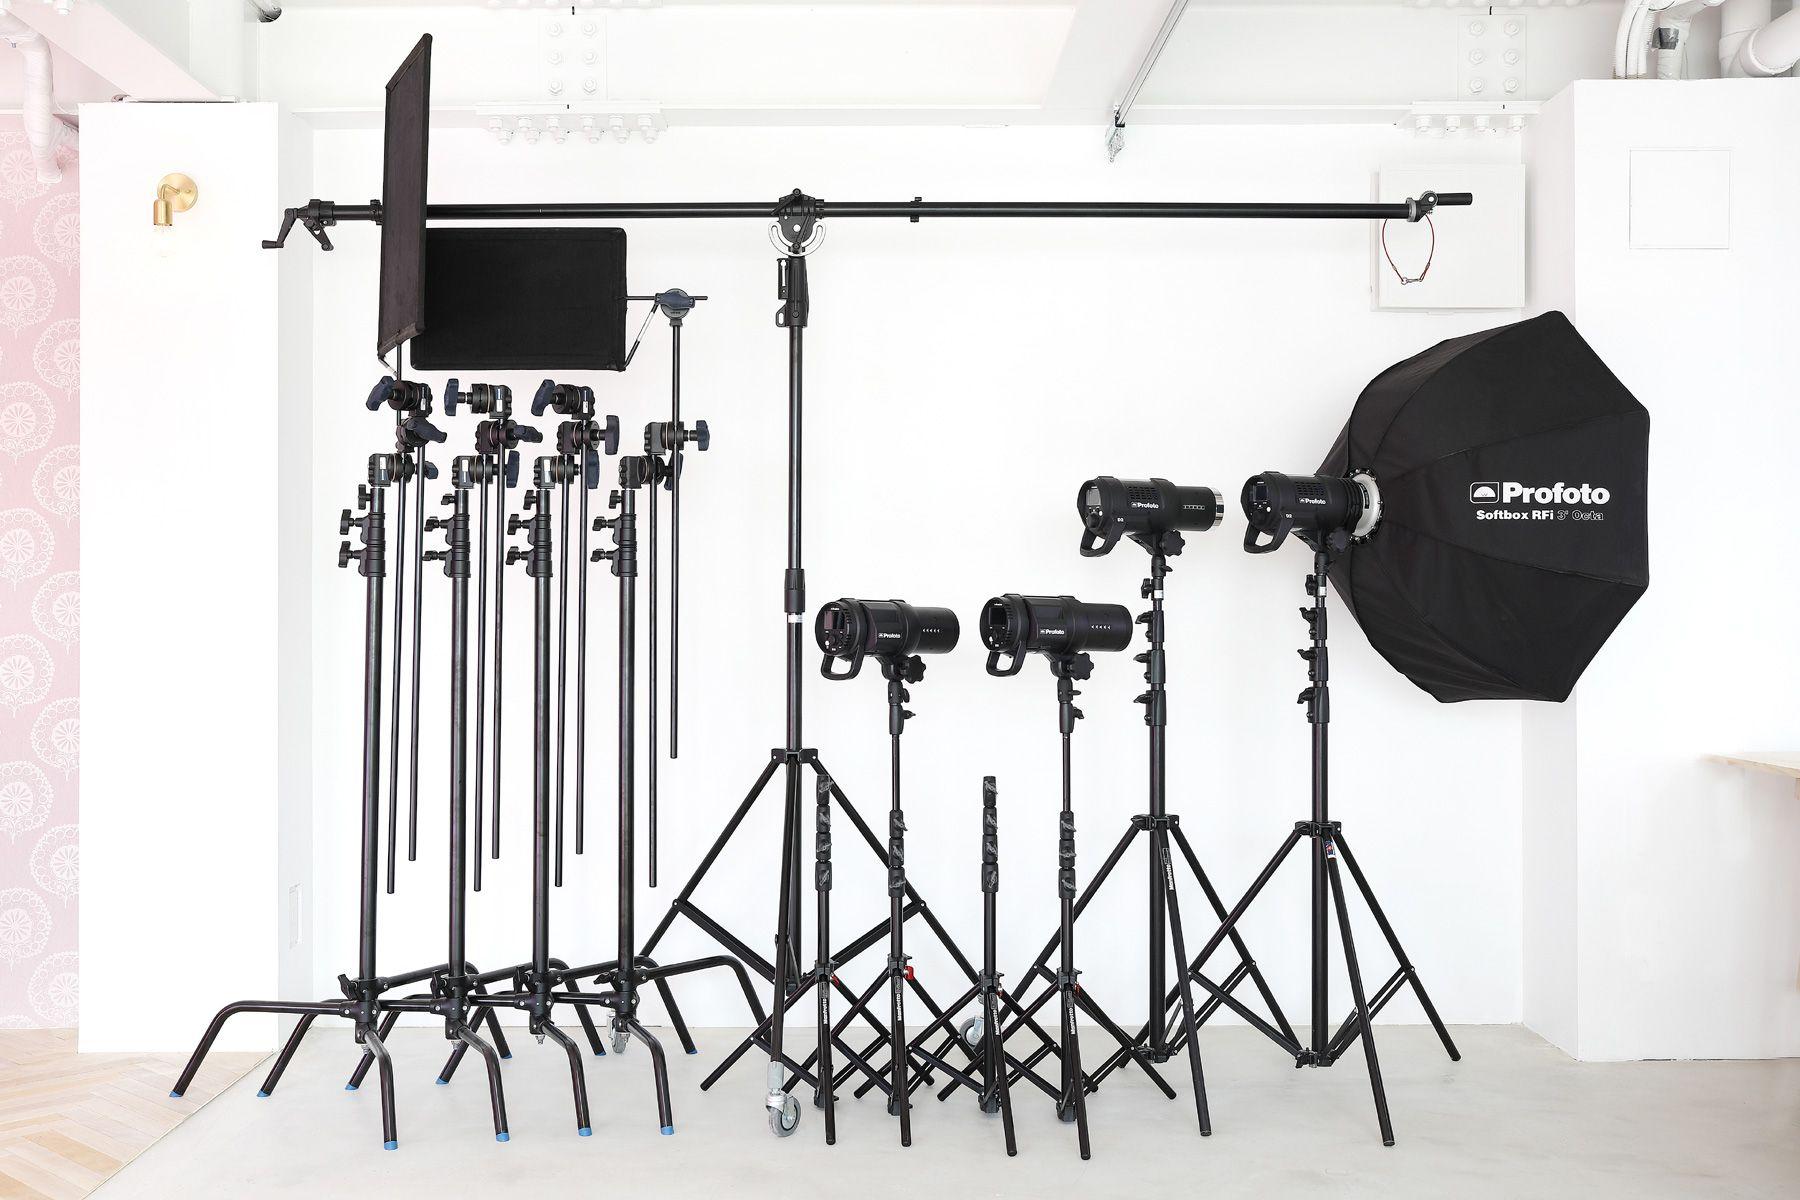 studio limll(スタジオ リムル)レンタル機材